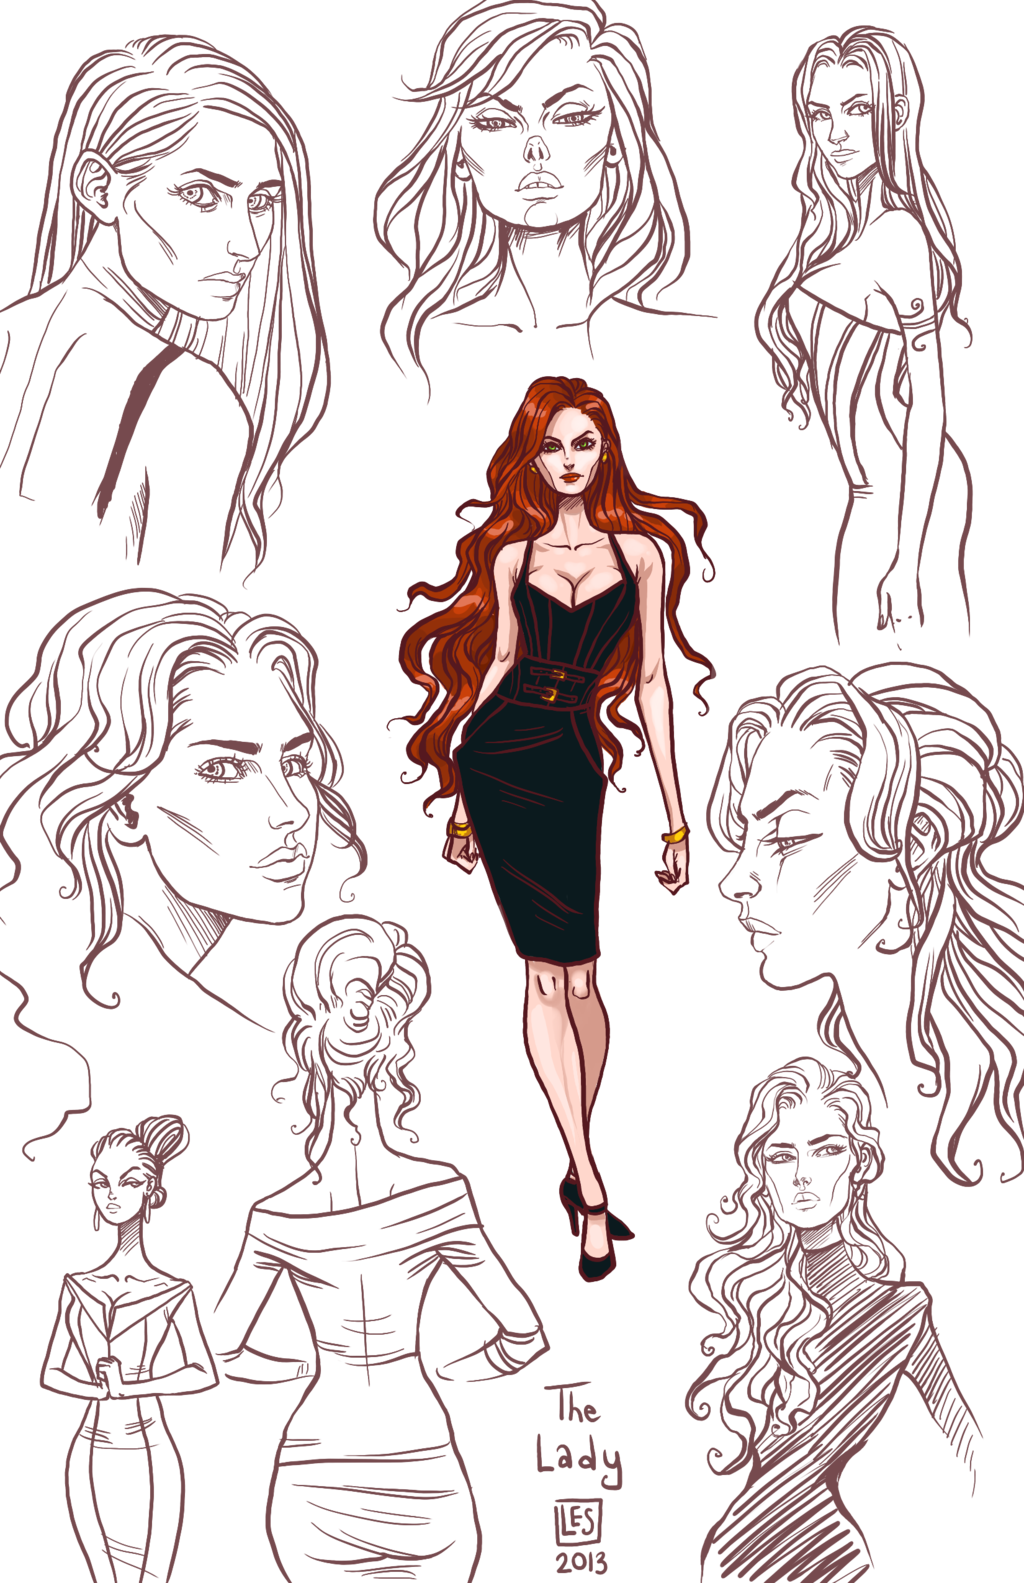 Sketch Page The Lady By Blackbirdink On Deviantart Sketches Art Female Sketch